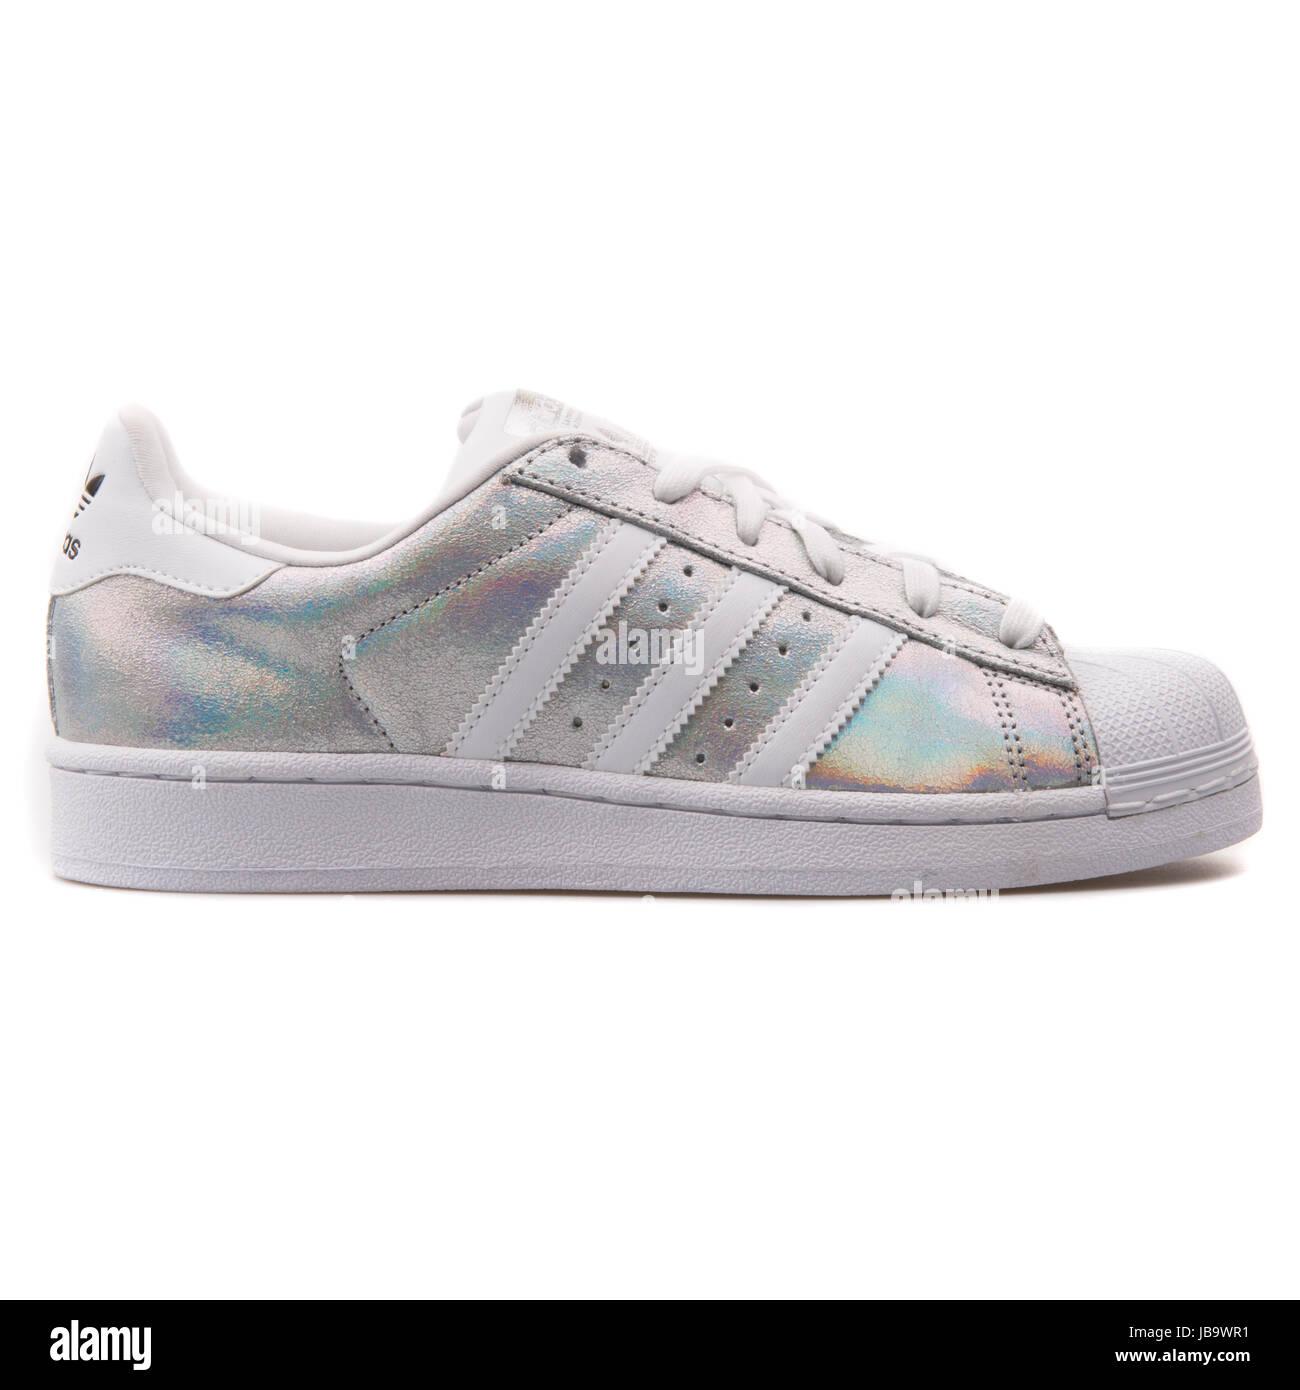 adidas superstar holographique - femme chaussures